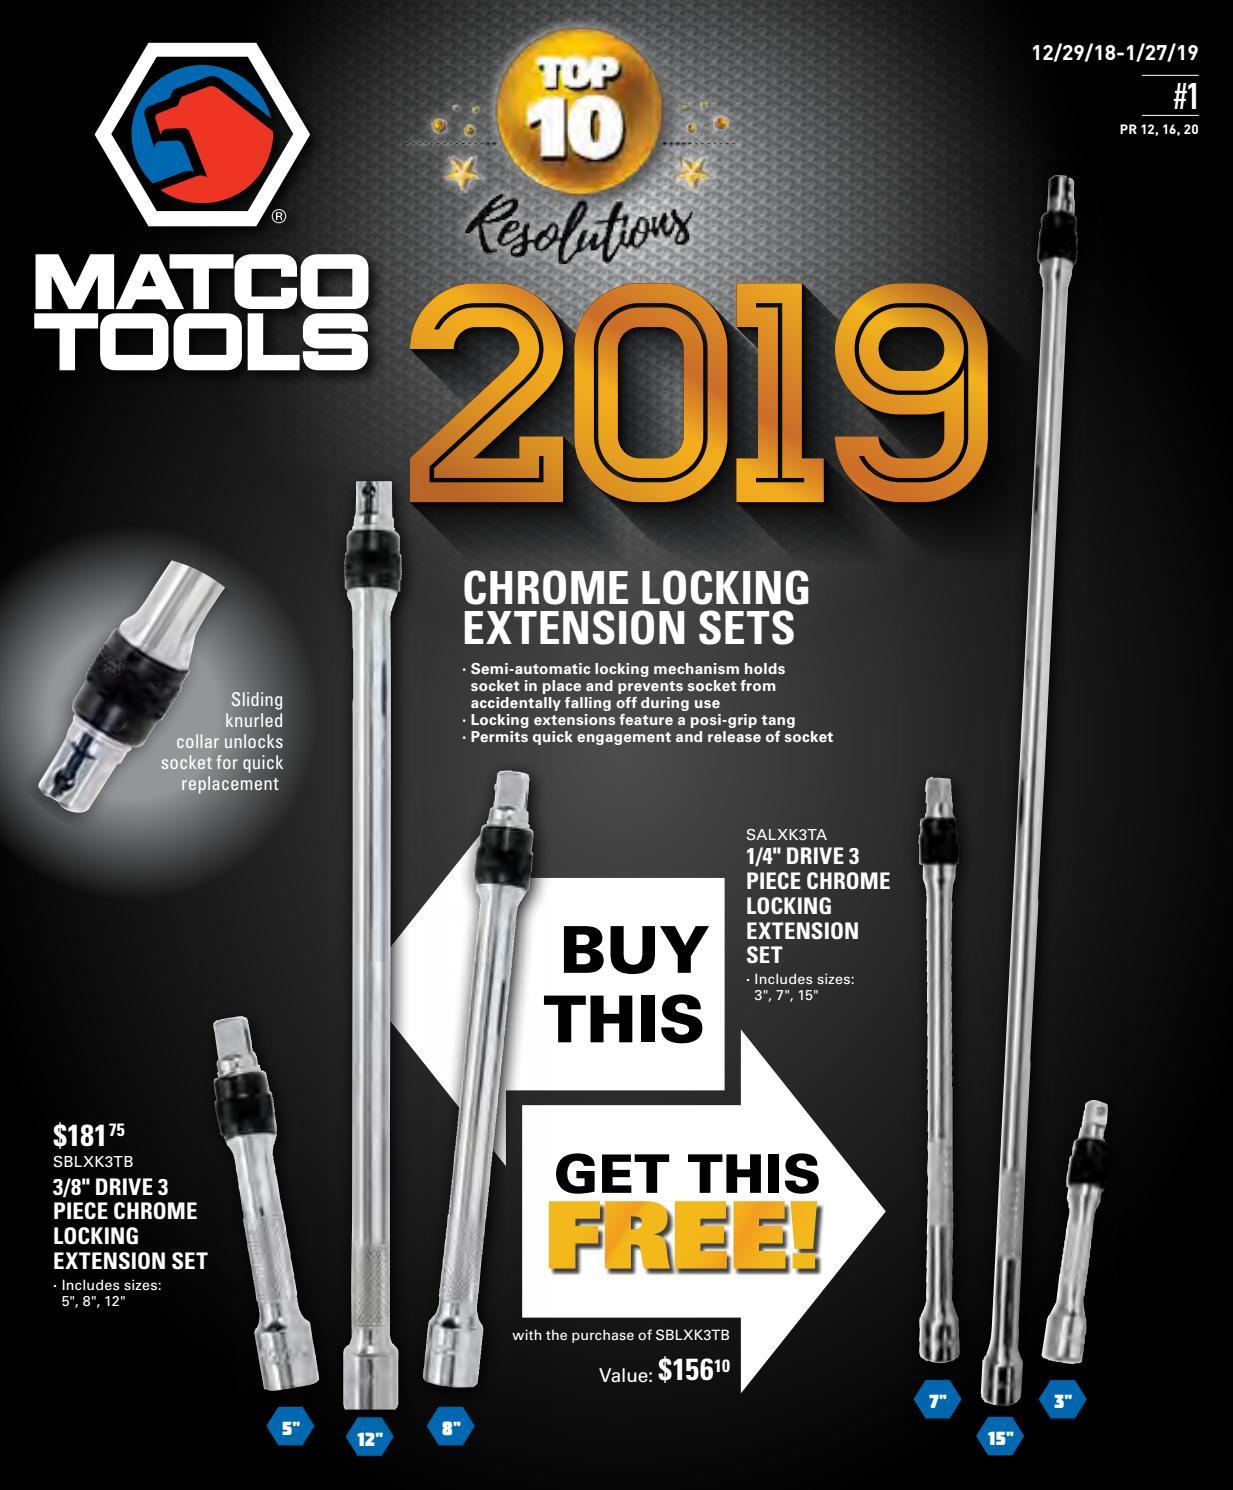 Matco Tools Flyer #1 2019 by Dean Austin - issuu